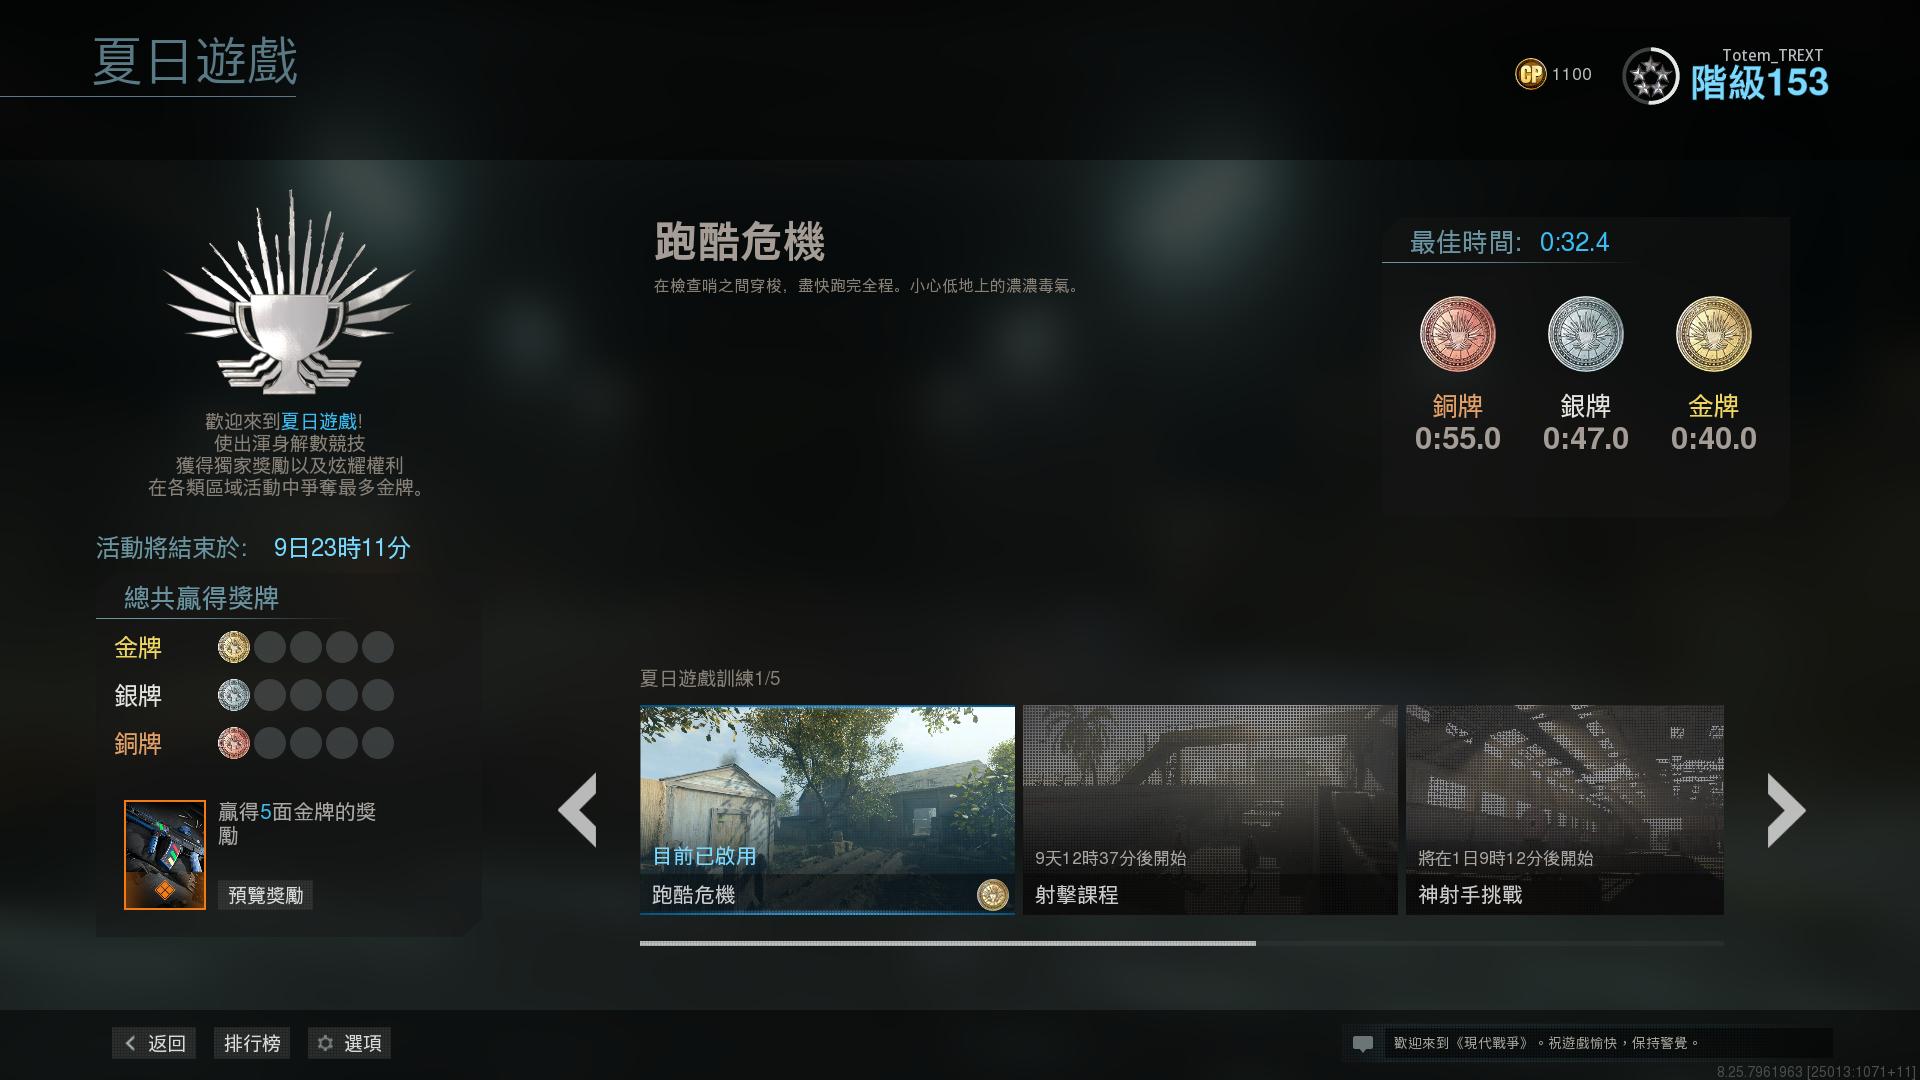 【COD16】夏日游戏 跑酷危机 32.4秒